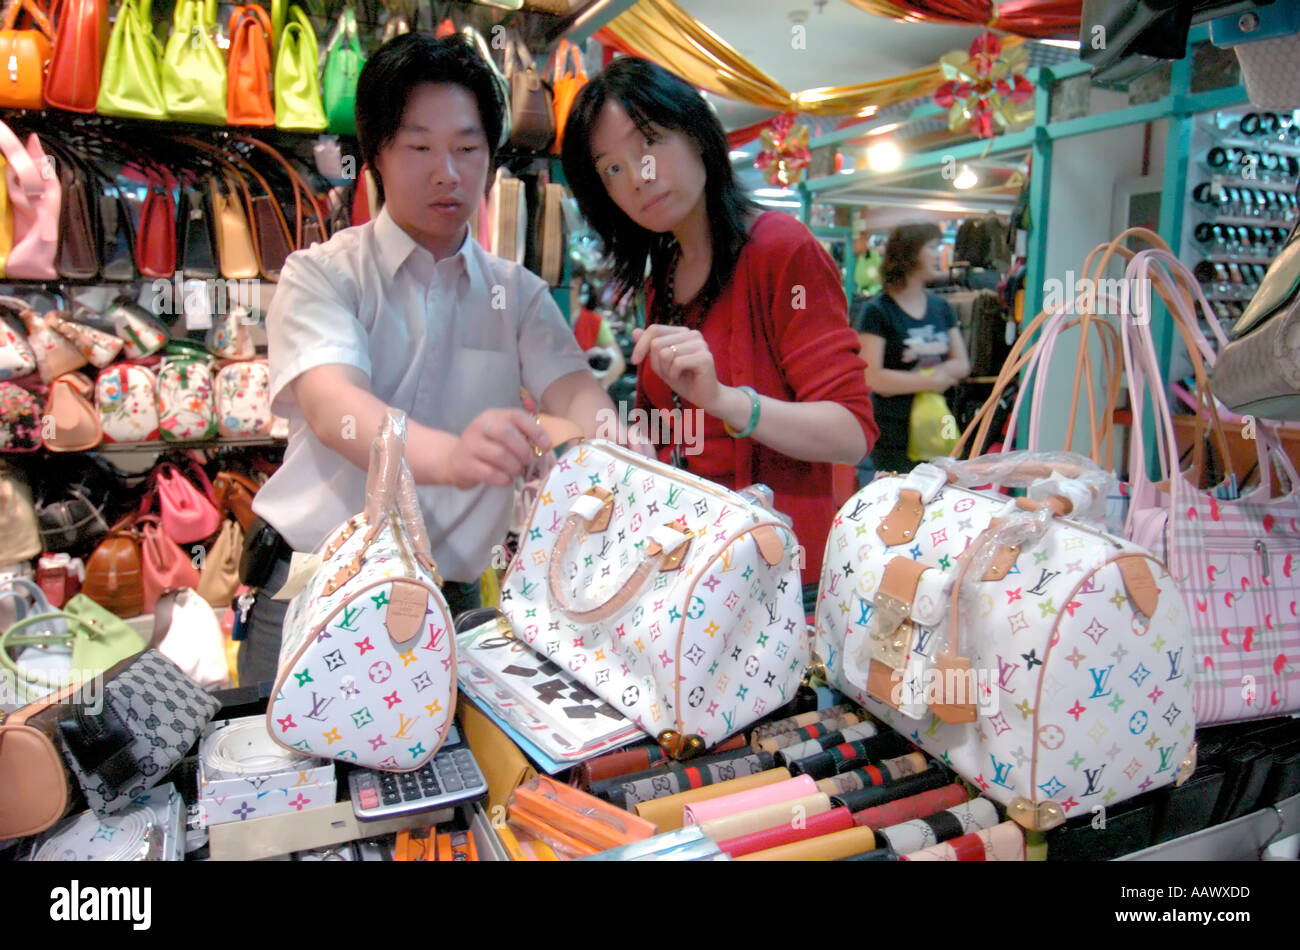 prada pink leather bag - Fake Brands Stock Photos \u0026amp; Fake Brands Stock Images - Alamy